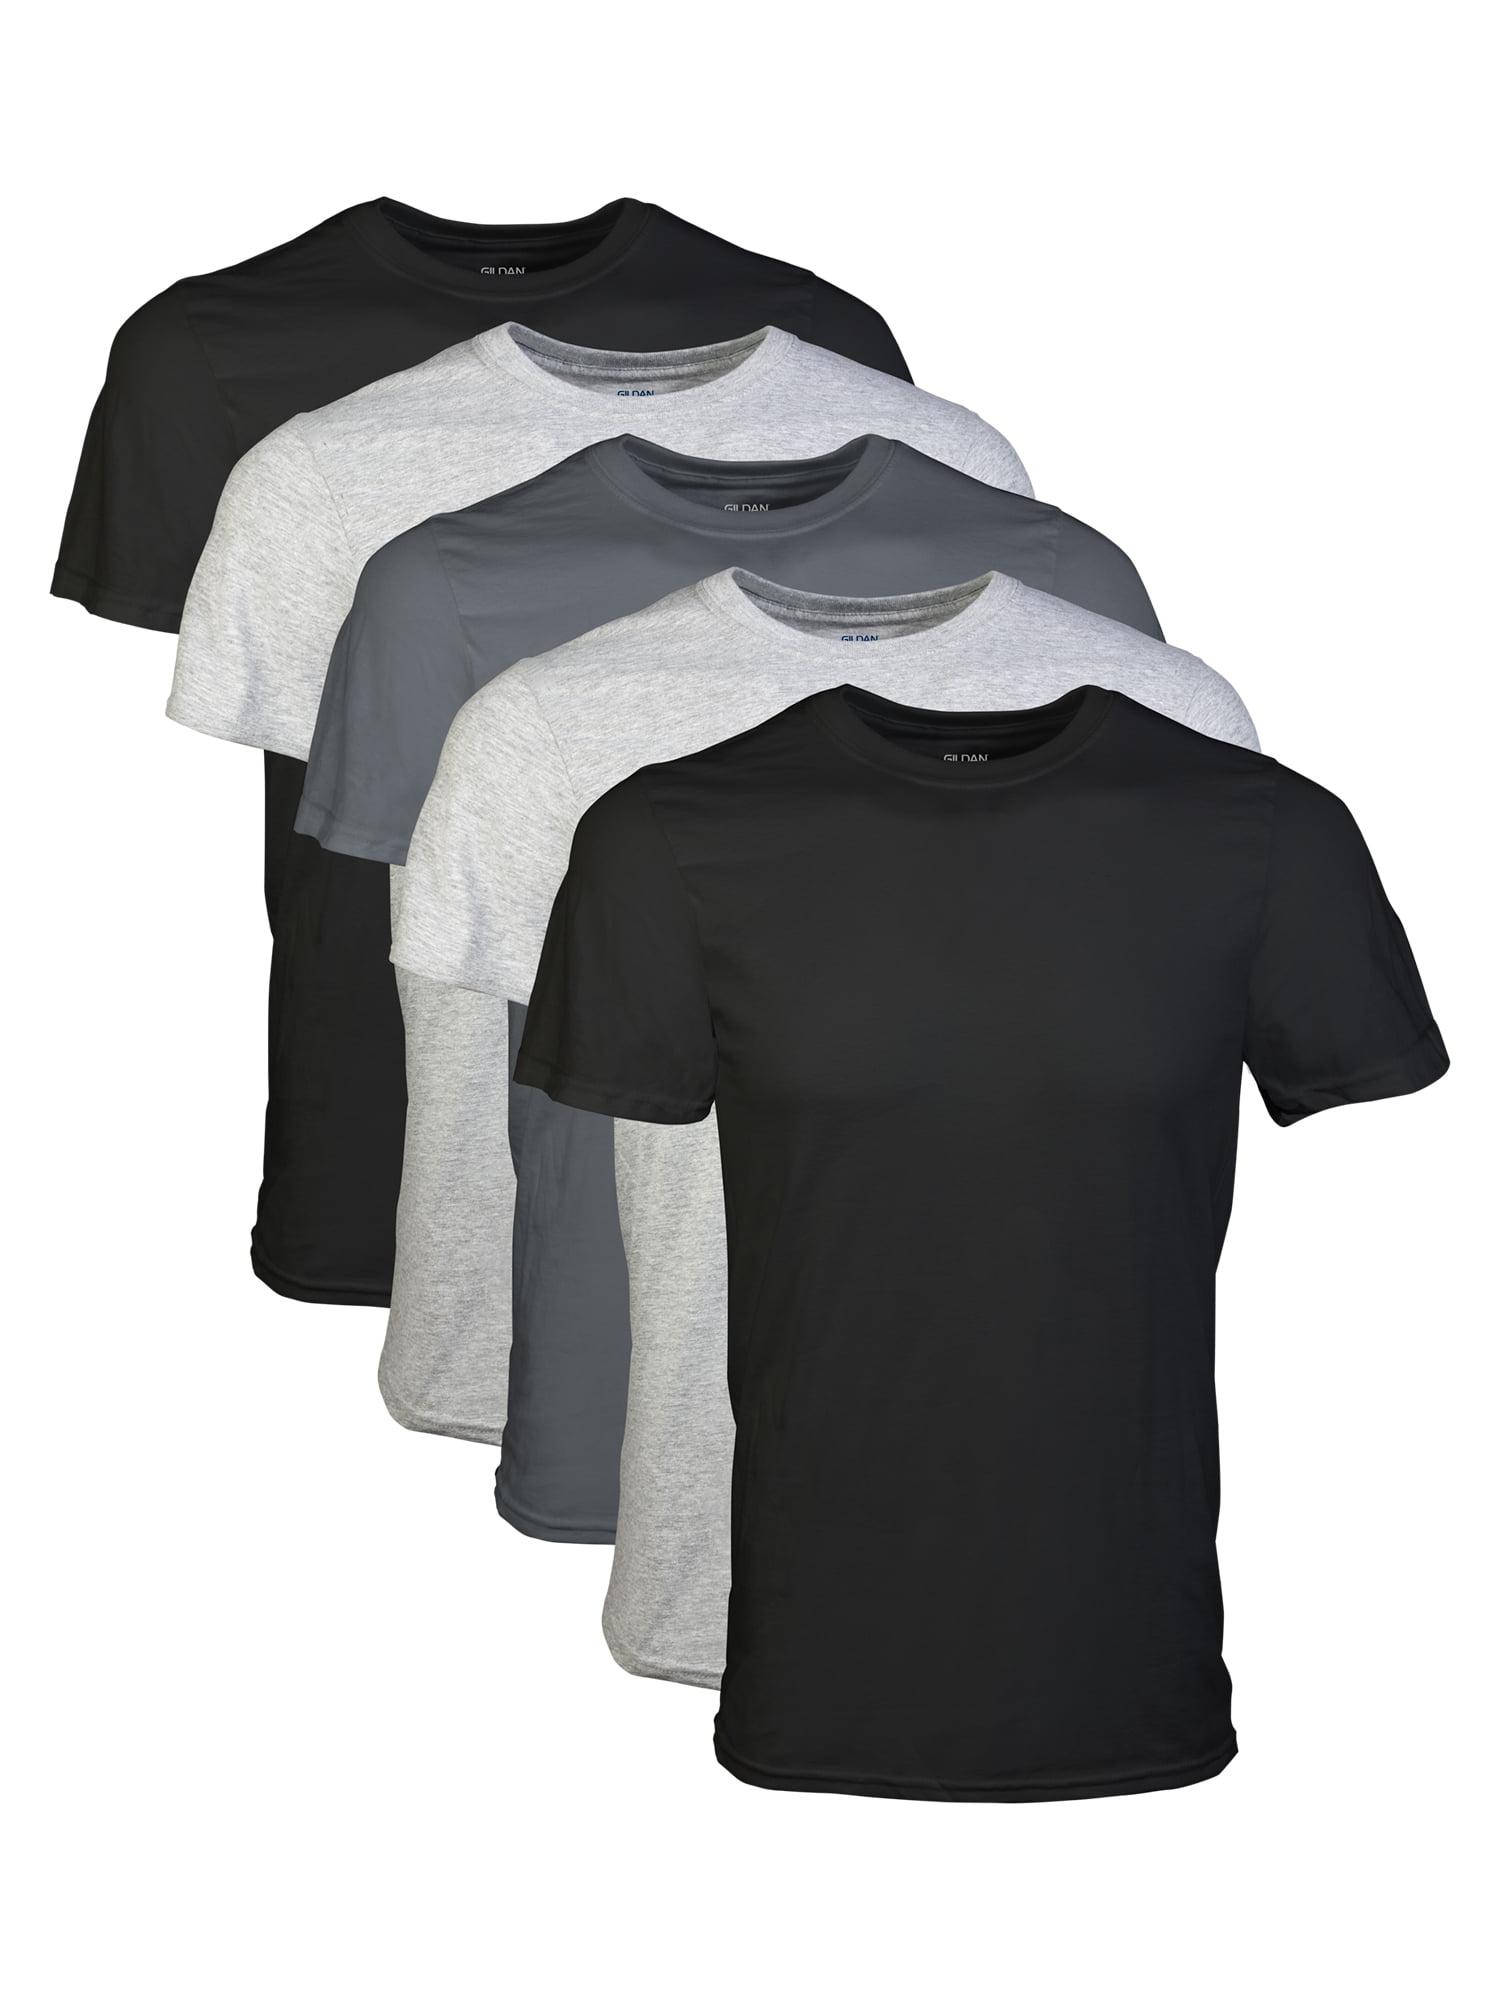 10c67c55b Mens Short Sleeve Crew Assorted Color T-Shirt, 5-Pack